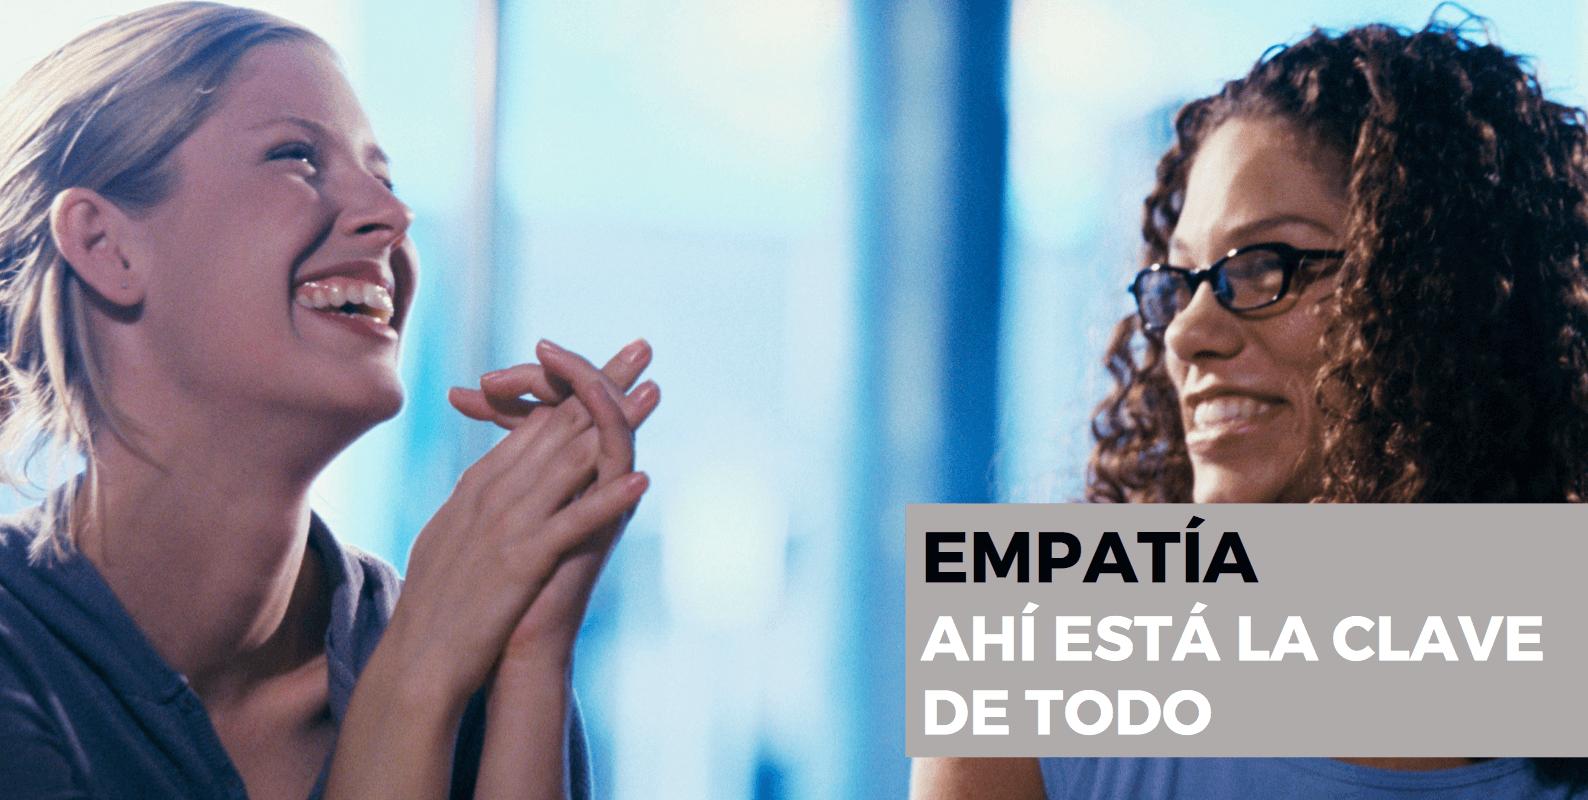 Cómo actuar ante noticias falsas: comunicar con empatía | Wide Marketing